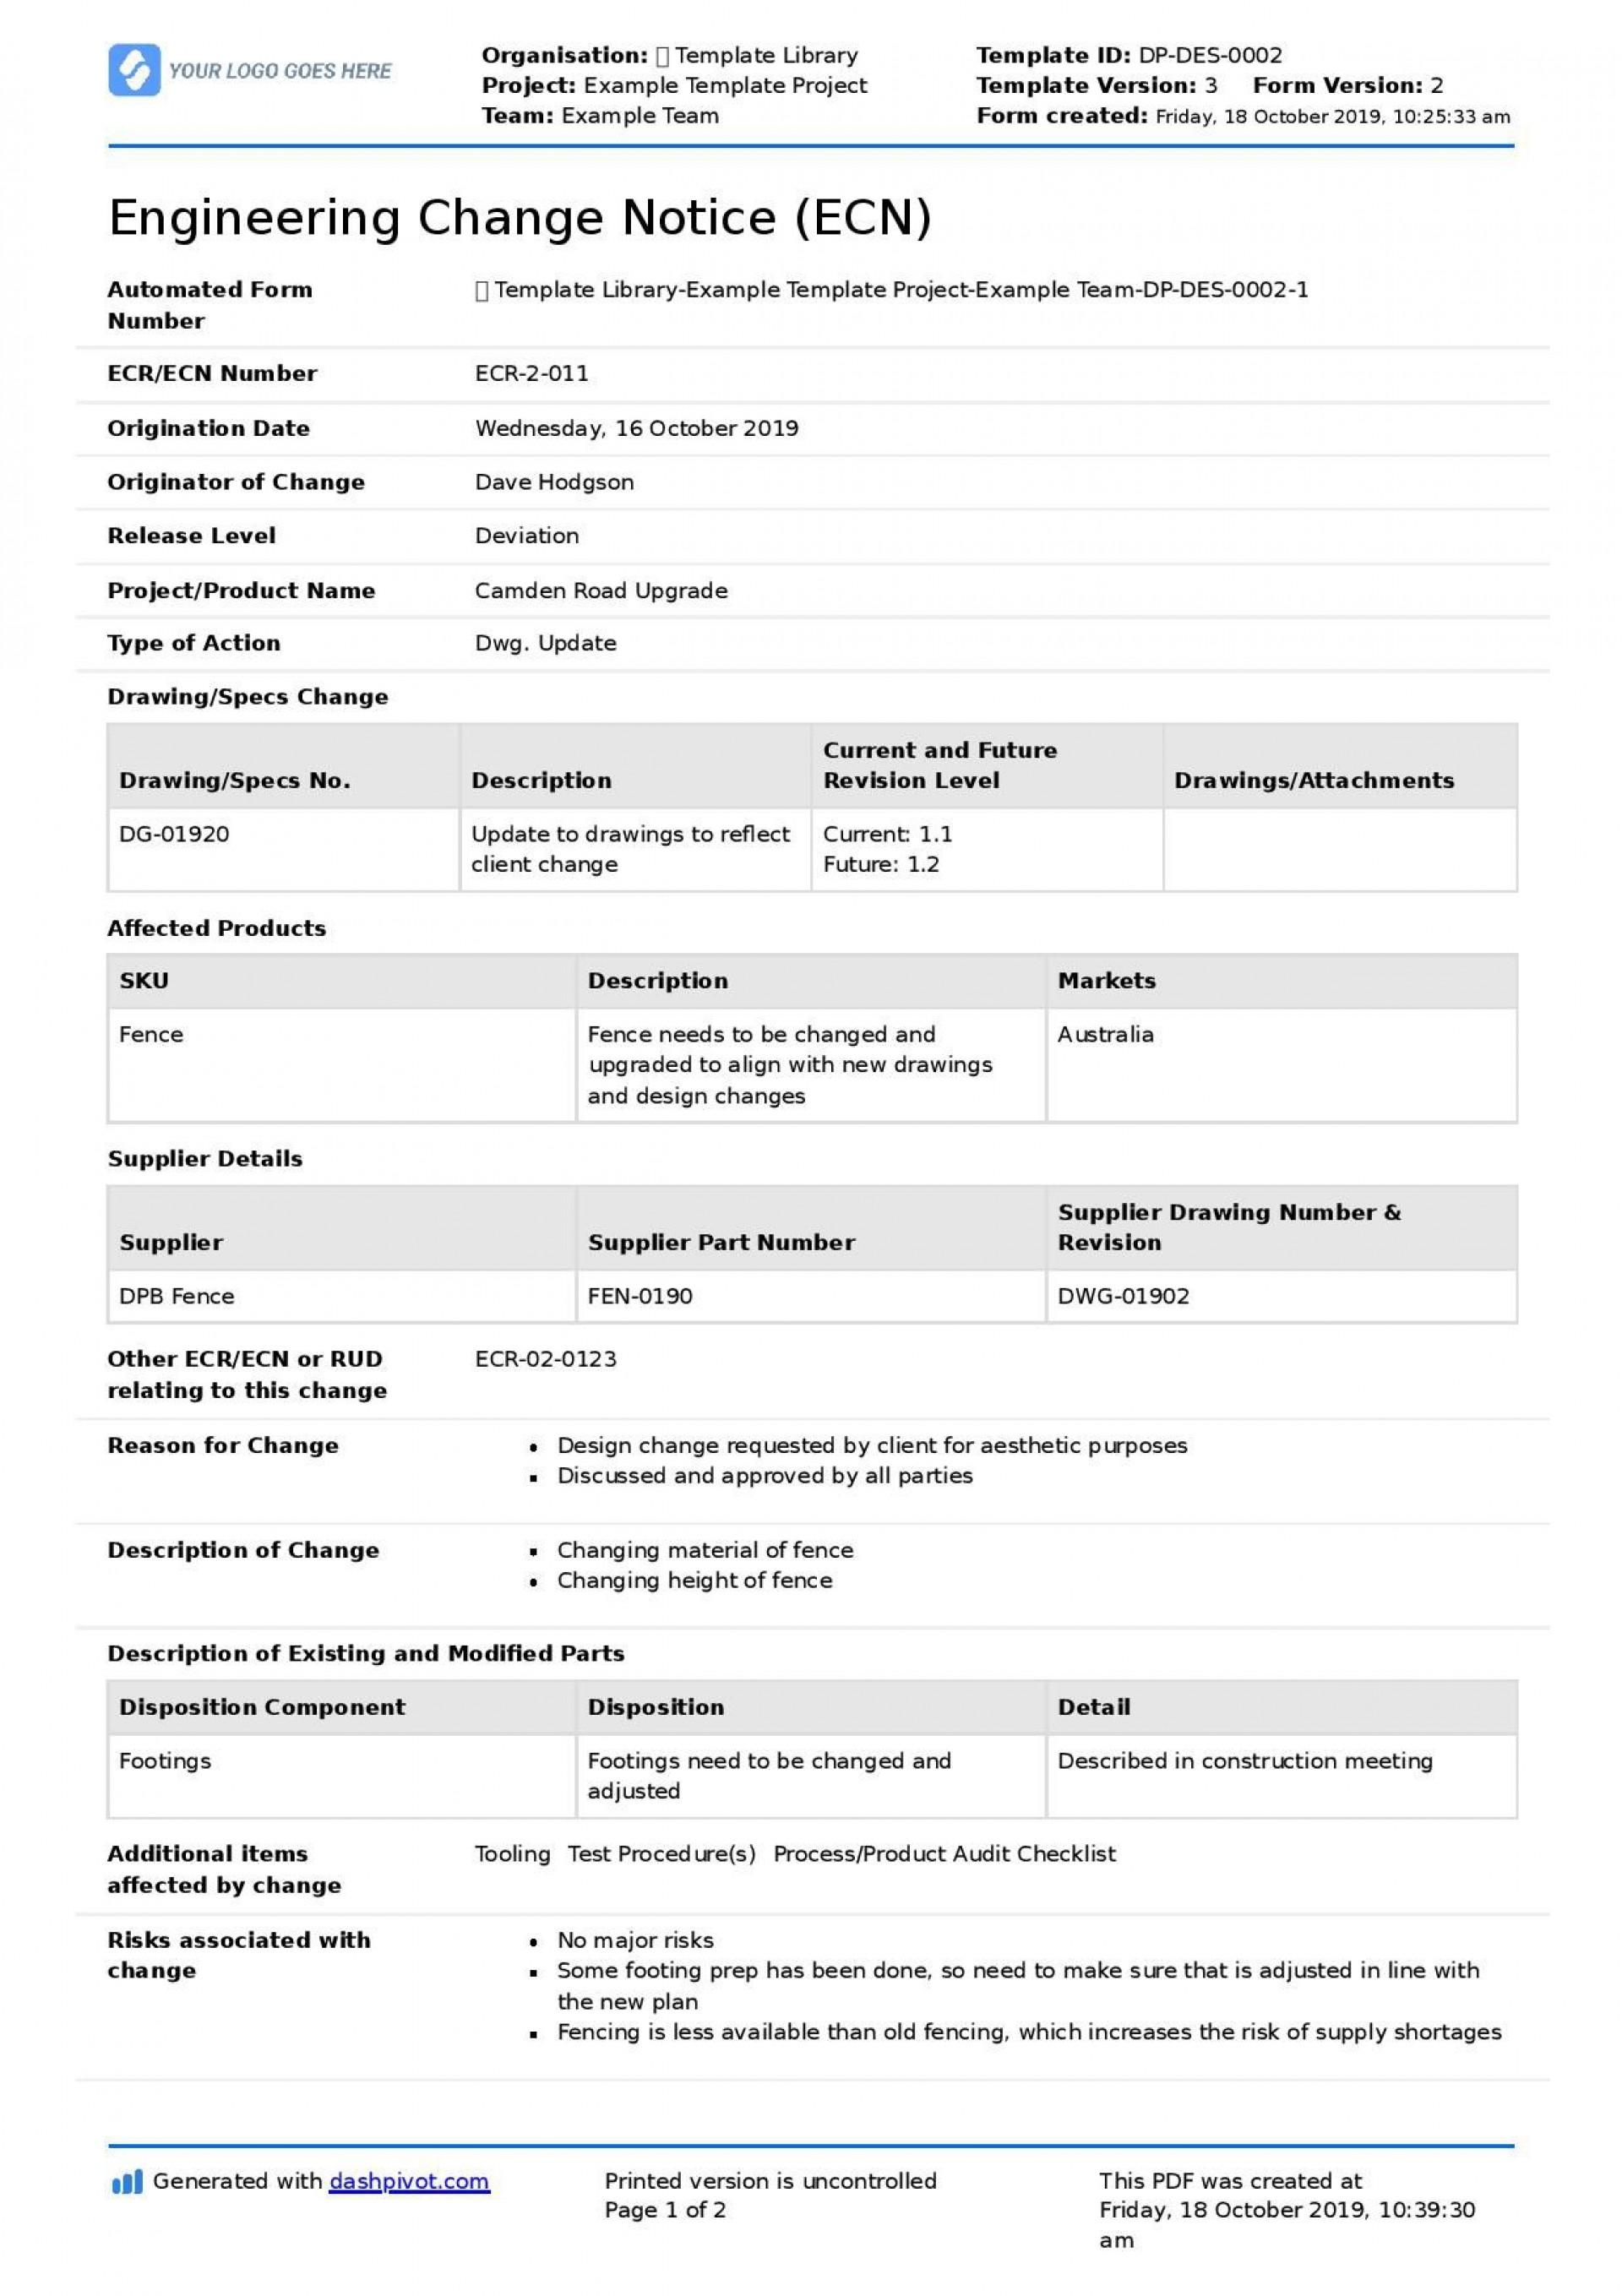 002 Best Engineering Change Order Template High Resolution 1920